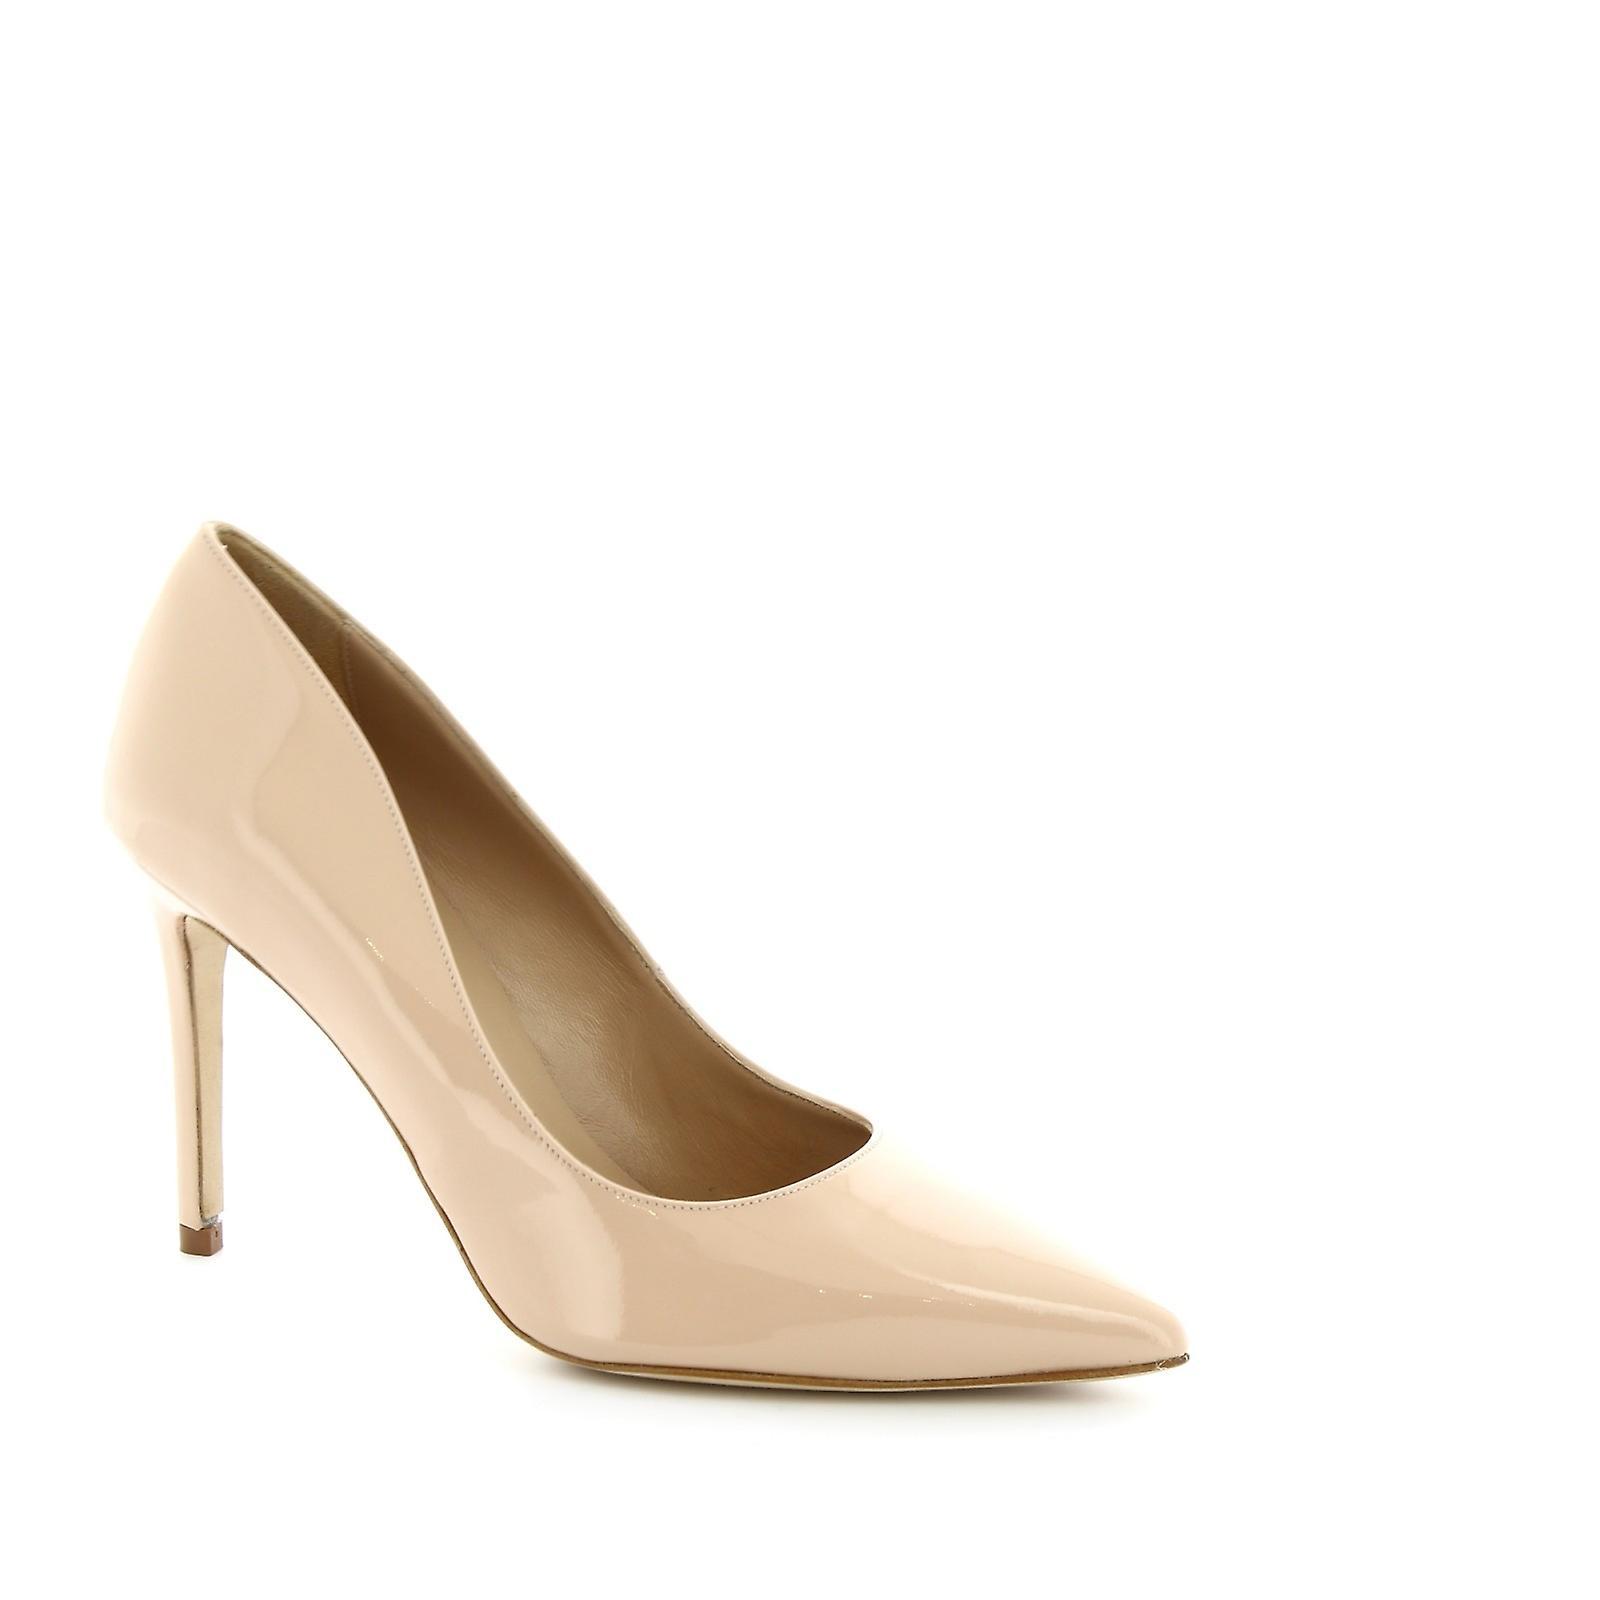 Leonardo Shoes Women's handmade heel pumps in powder pink patent leather ABoT0